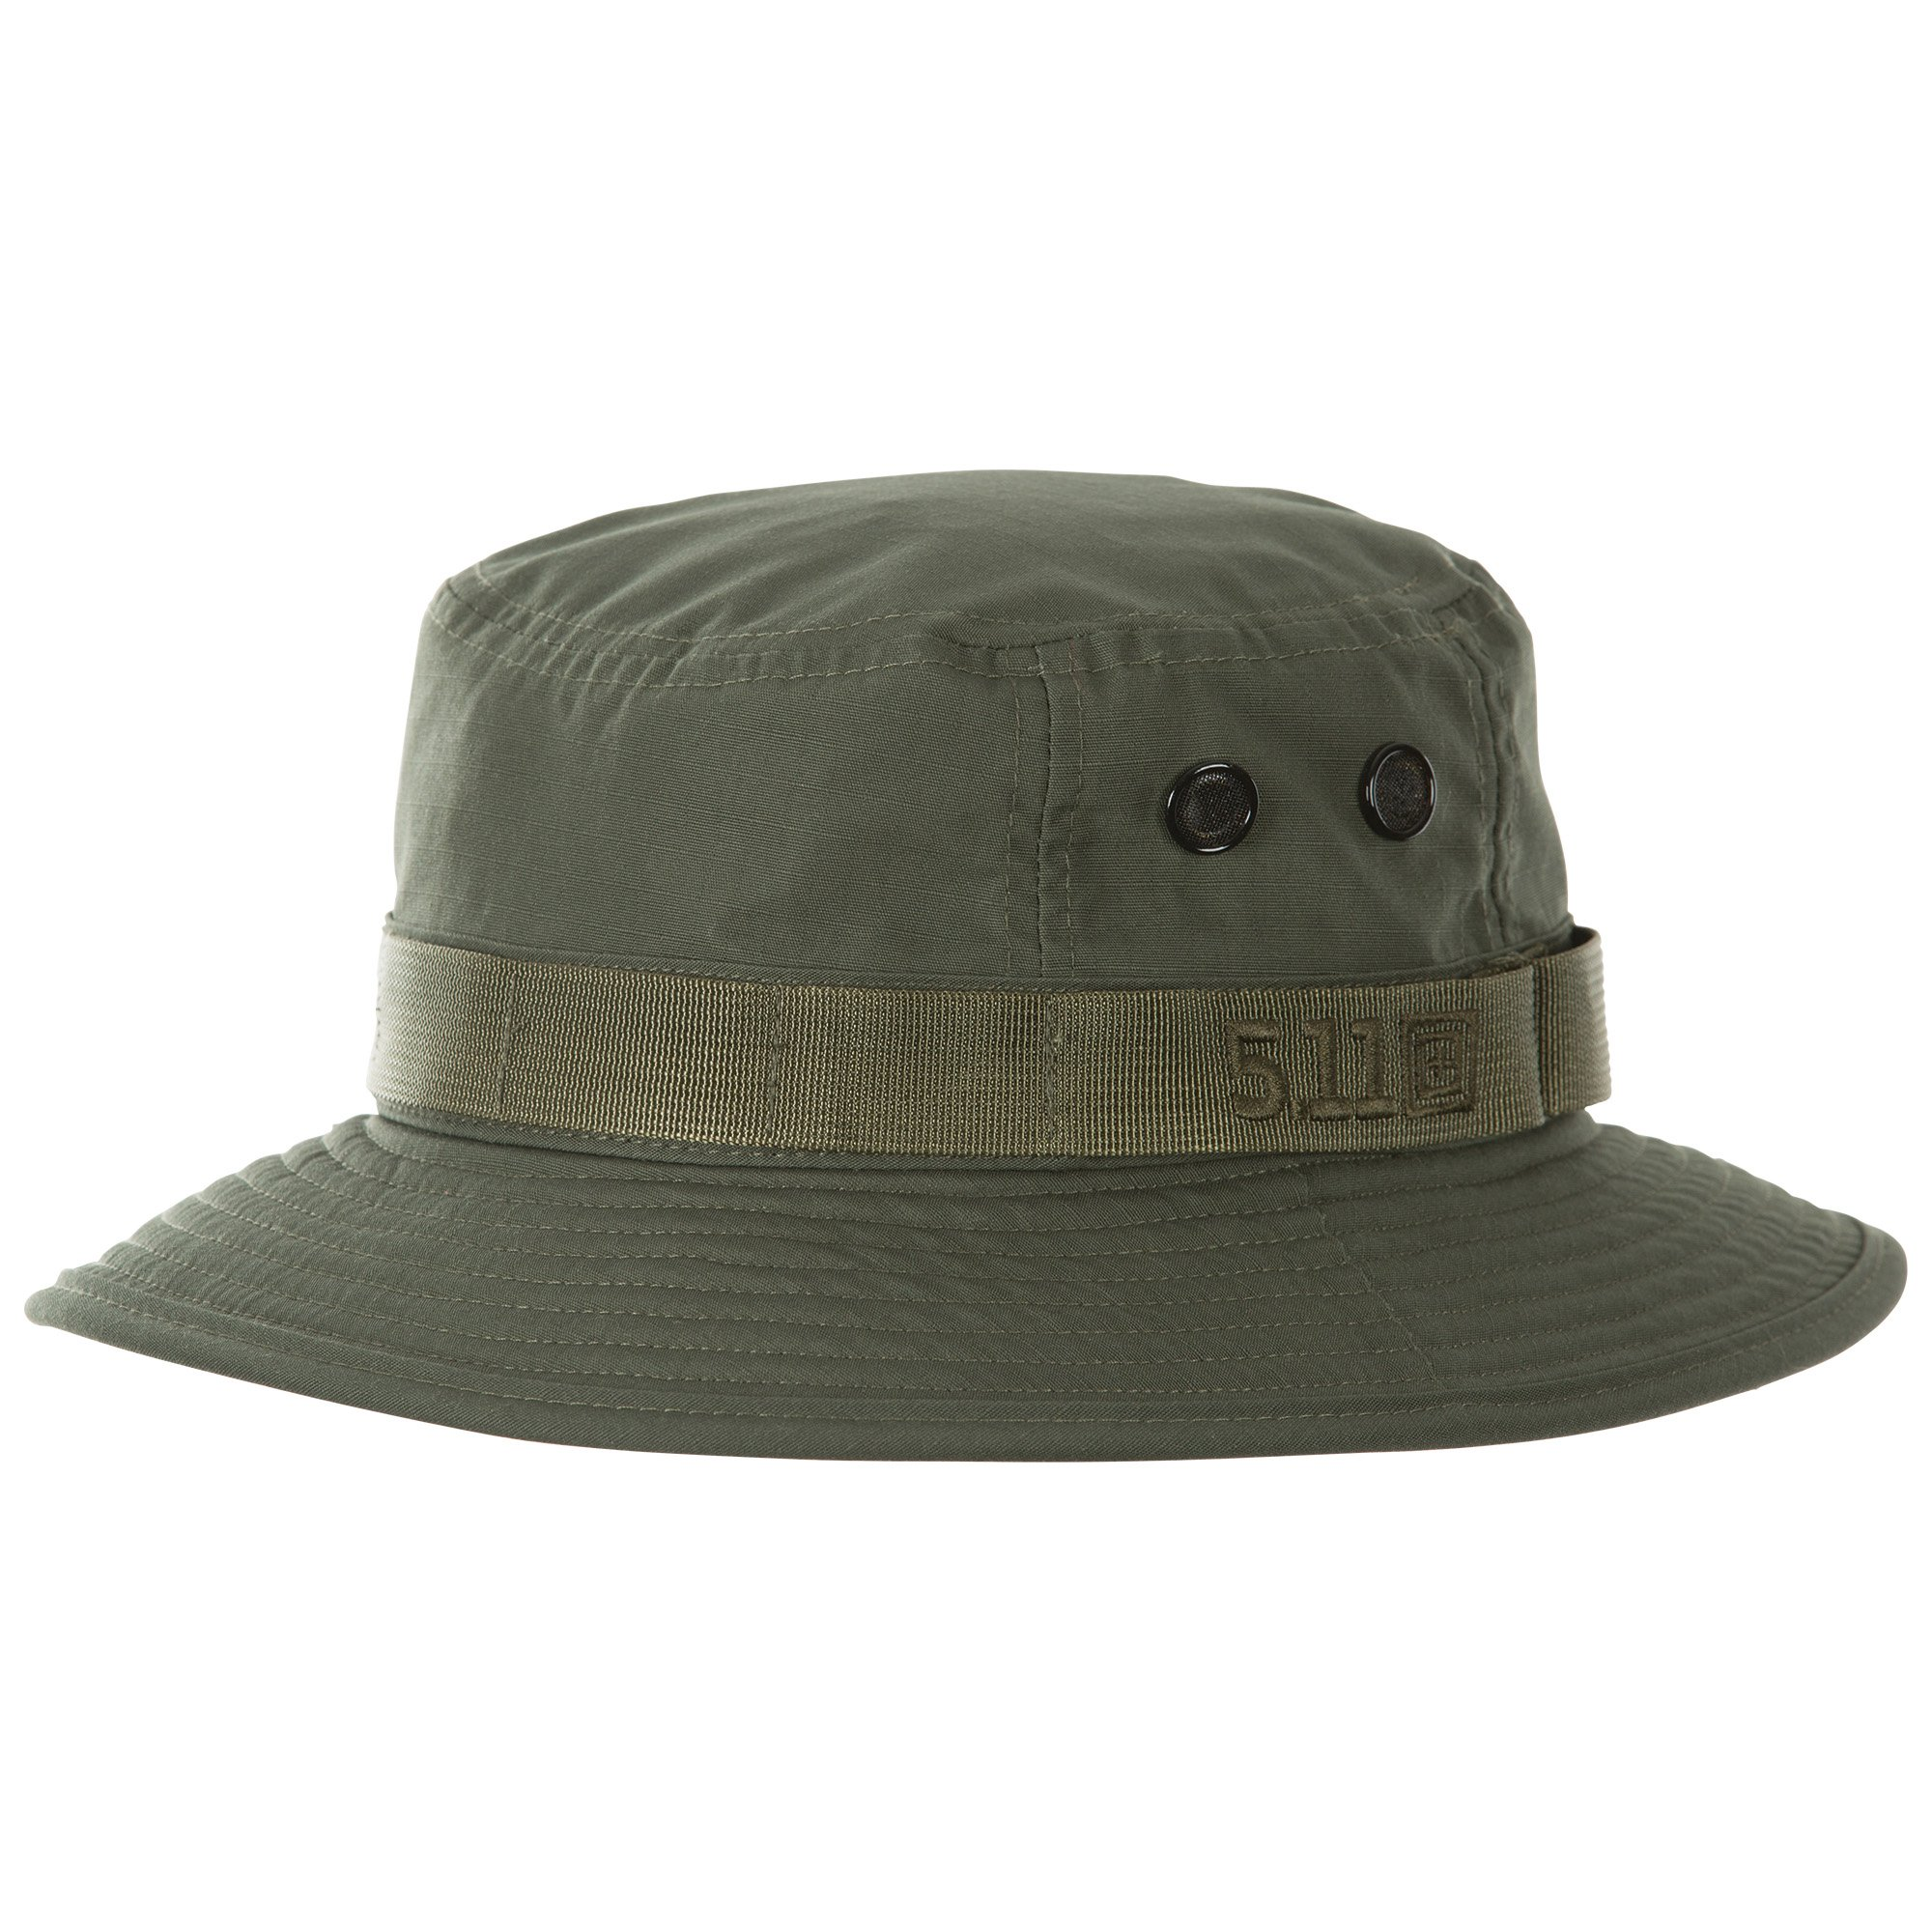 Nón 5.11 Tactical Boonie Hat – TDU Green